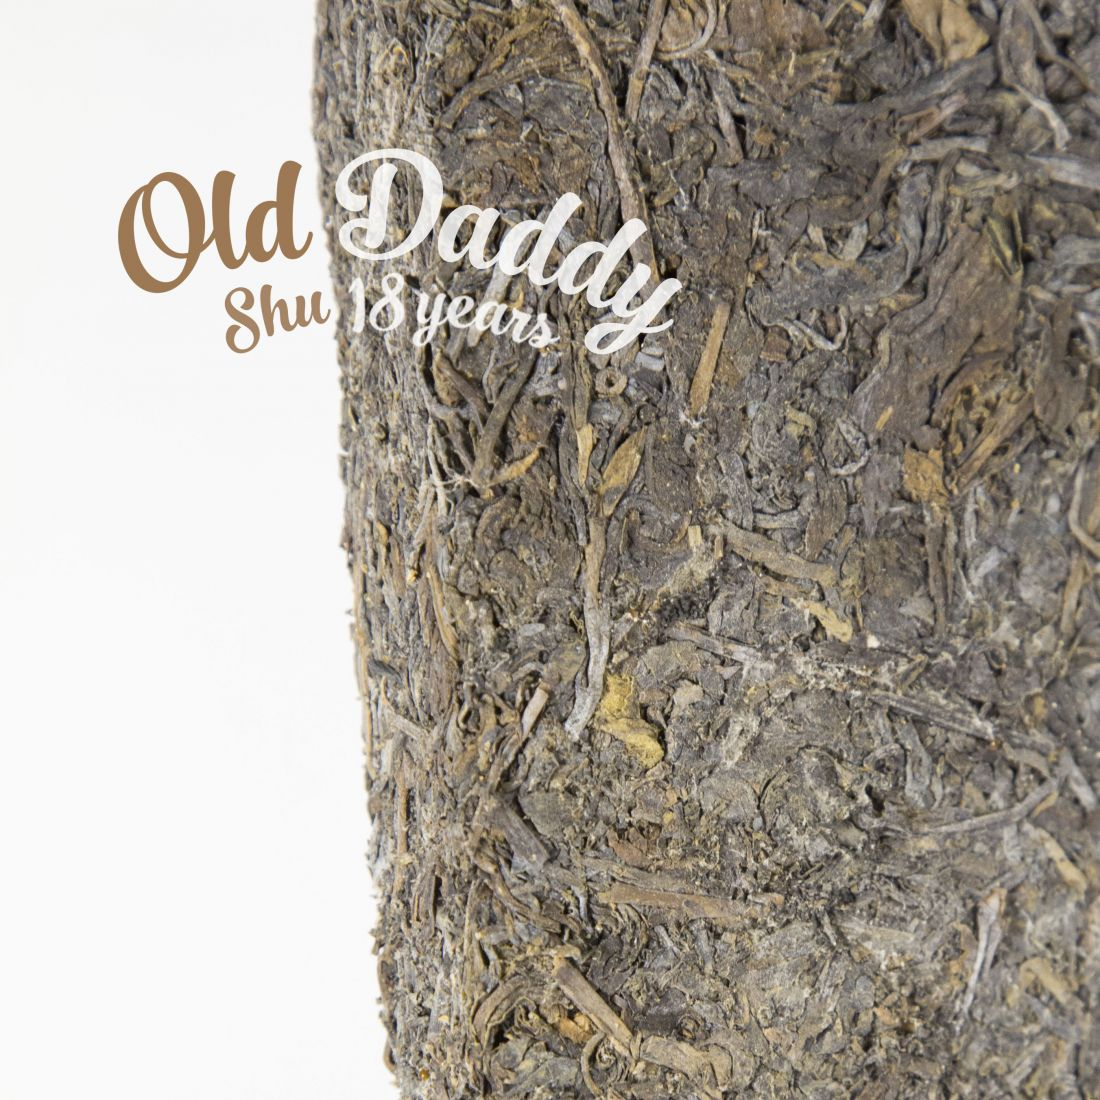 20 летний шу пуэр Old Daddy.